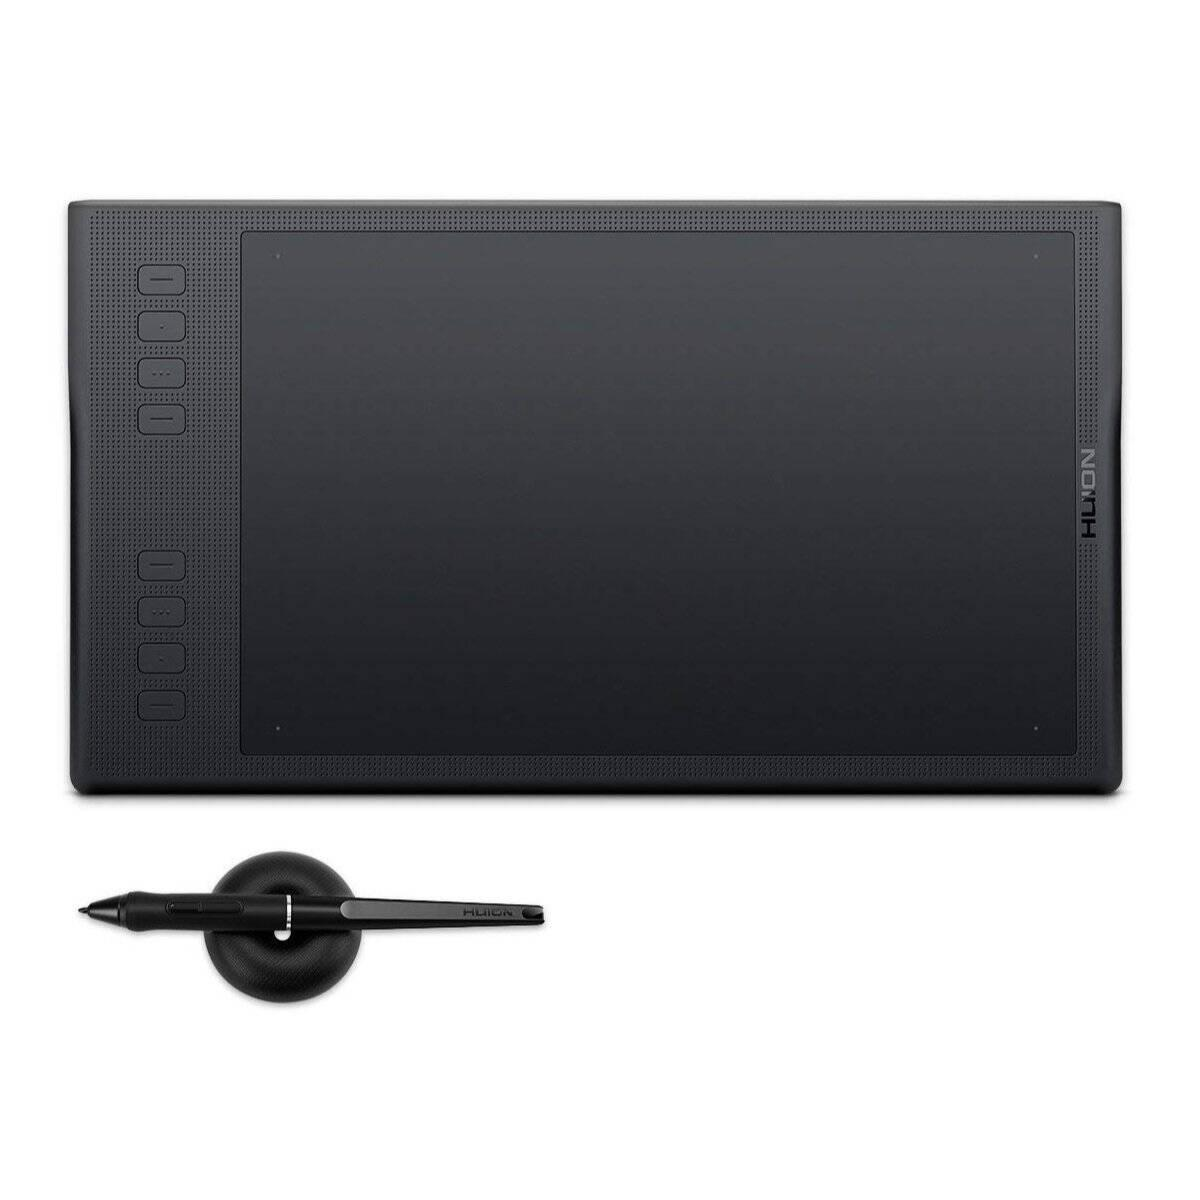 Графичен таблет HUION INSPIROY Q11K V2,  USB, WiFi,  Черен